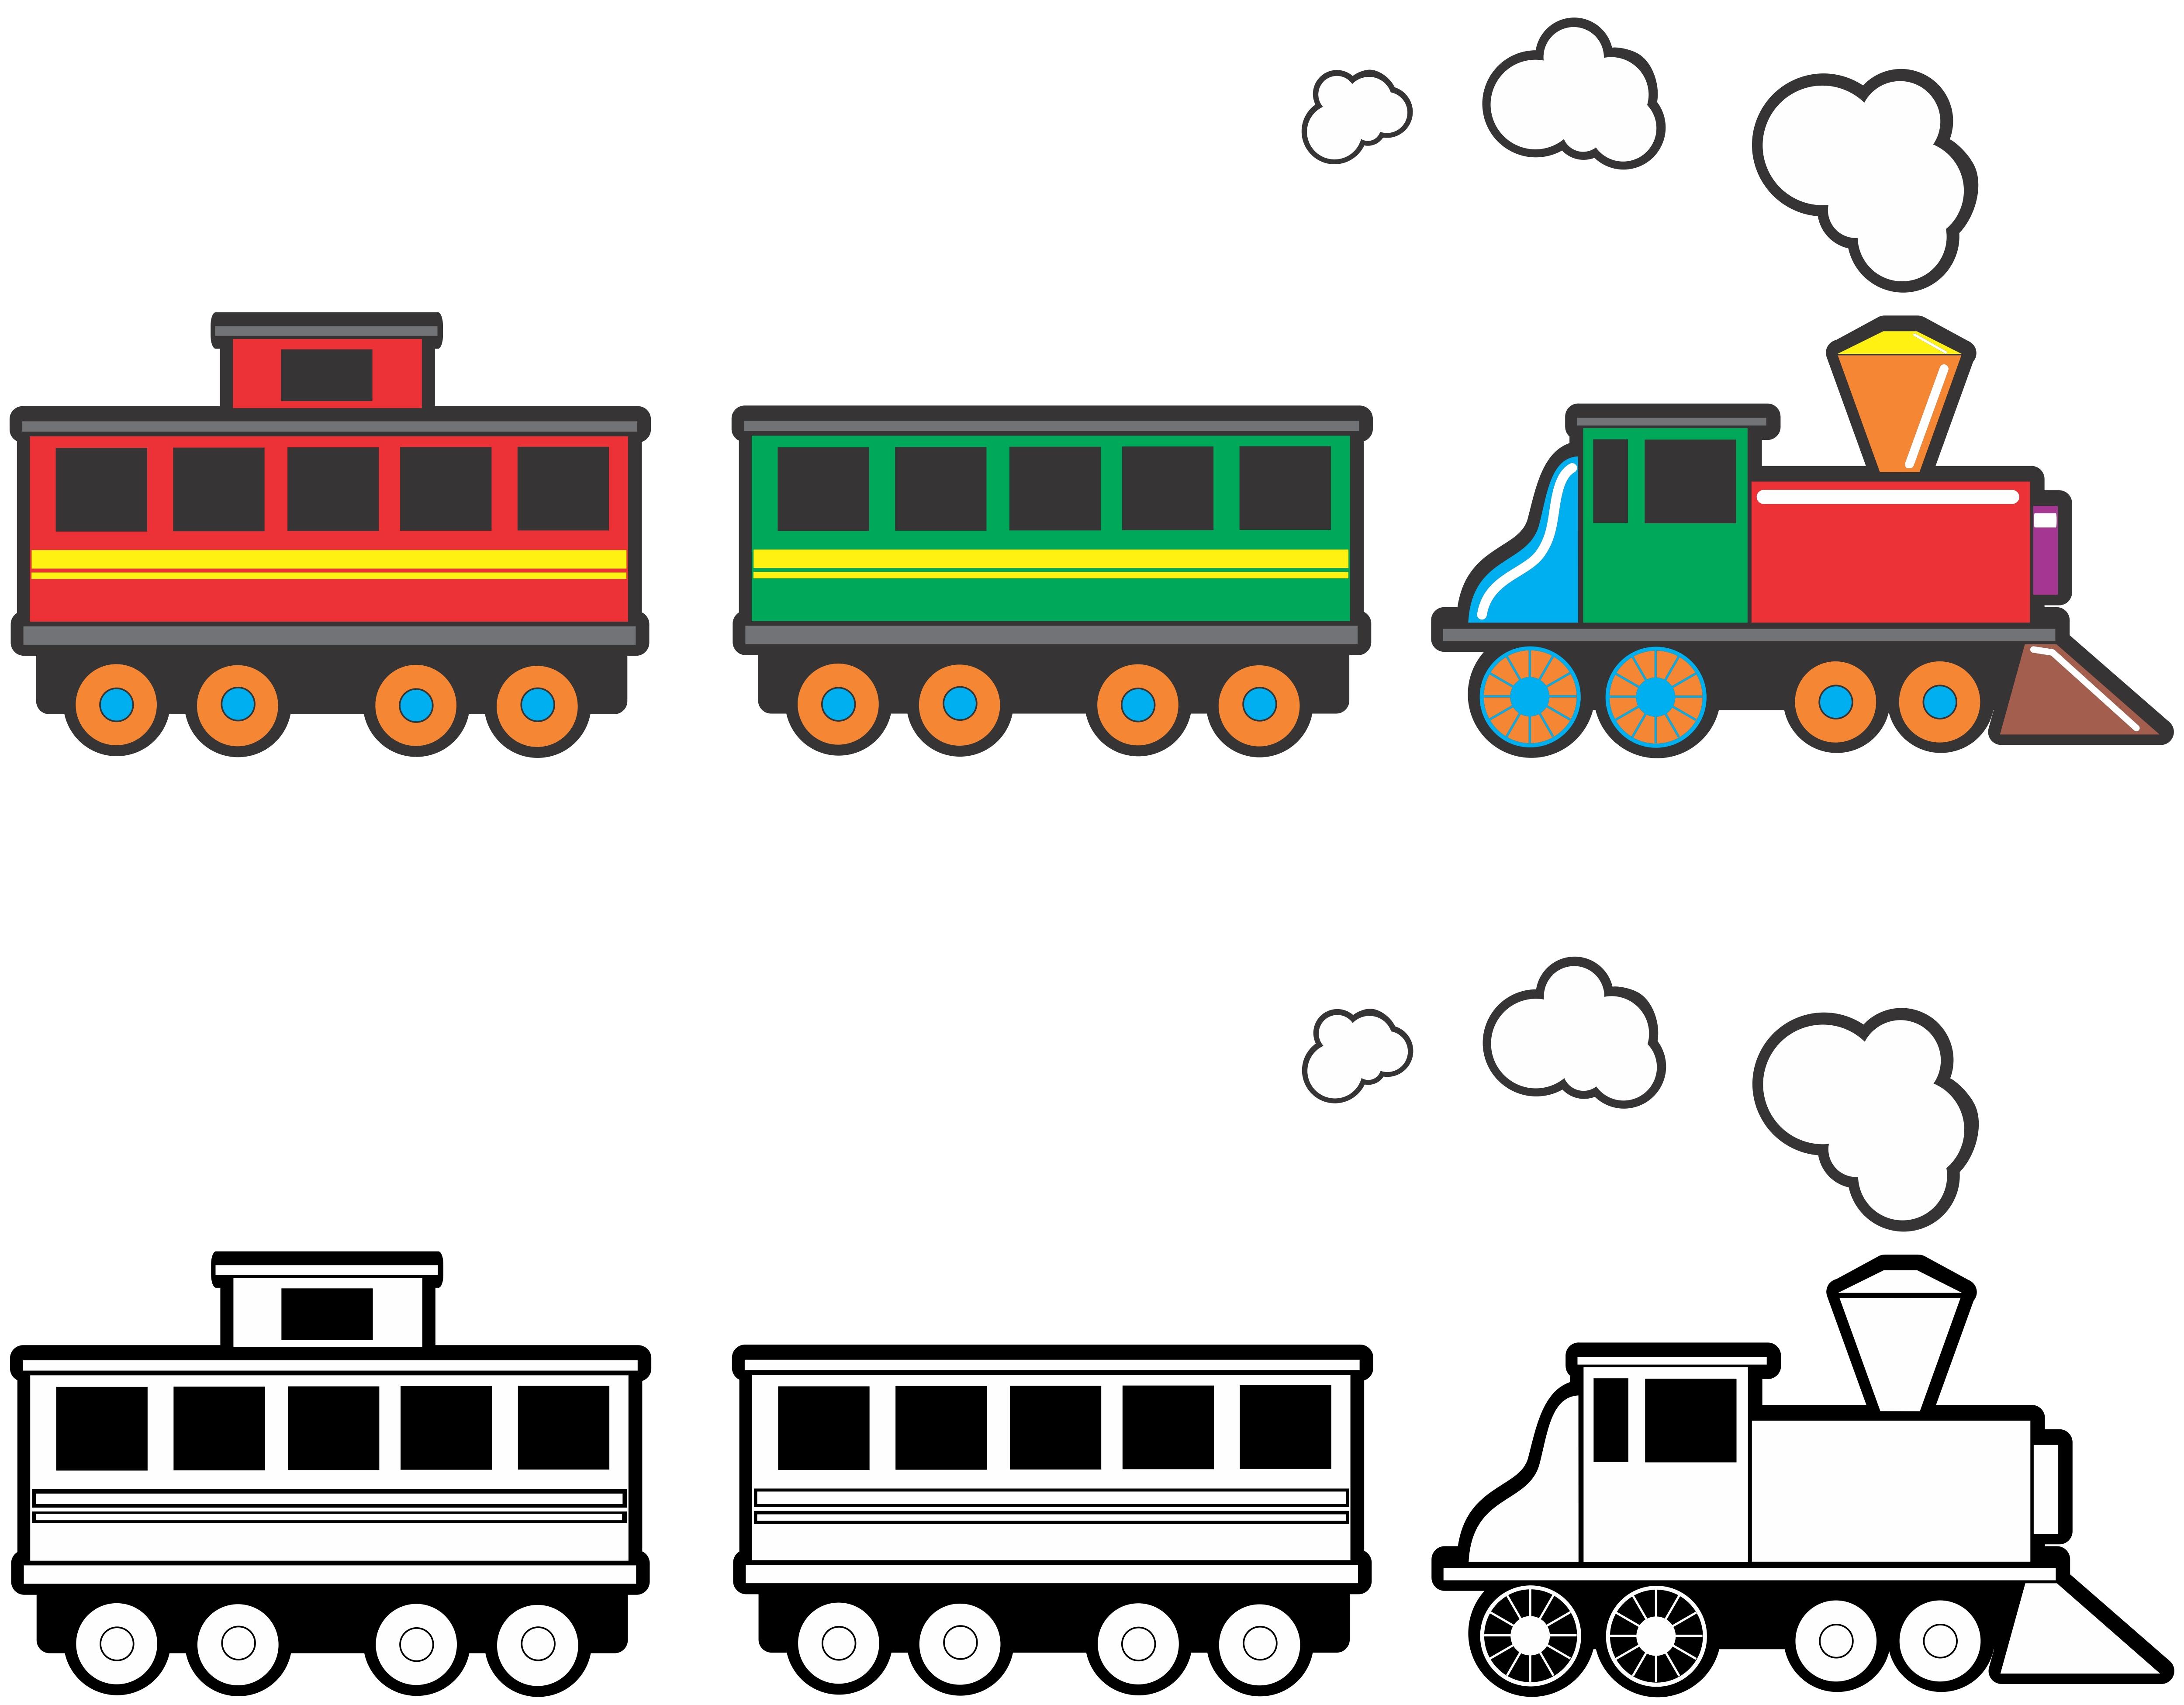 Train Clip Art : Cartoon train images clipart best